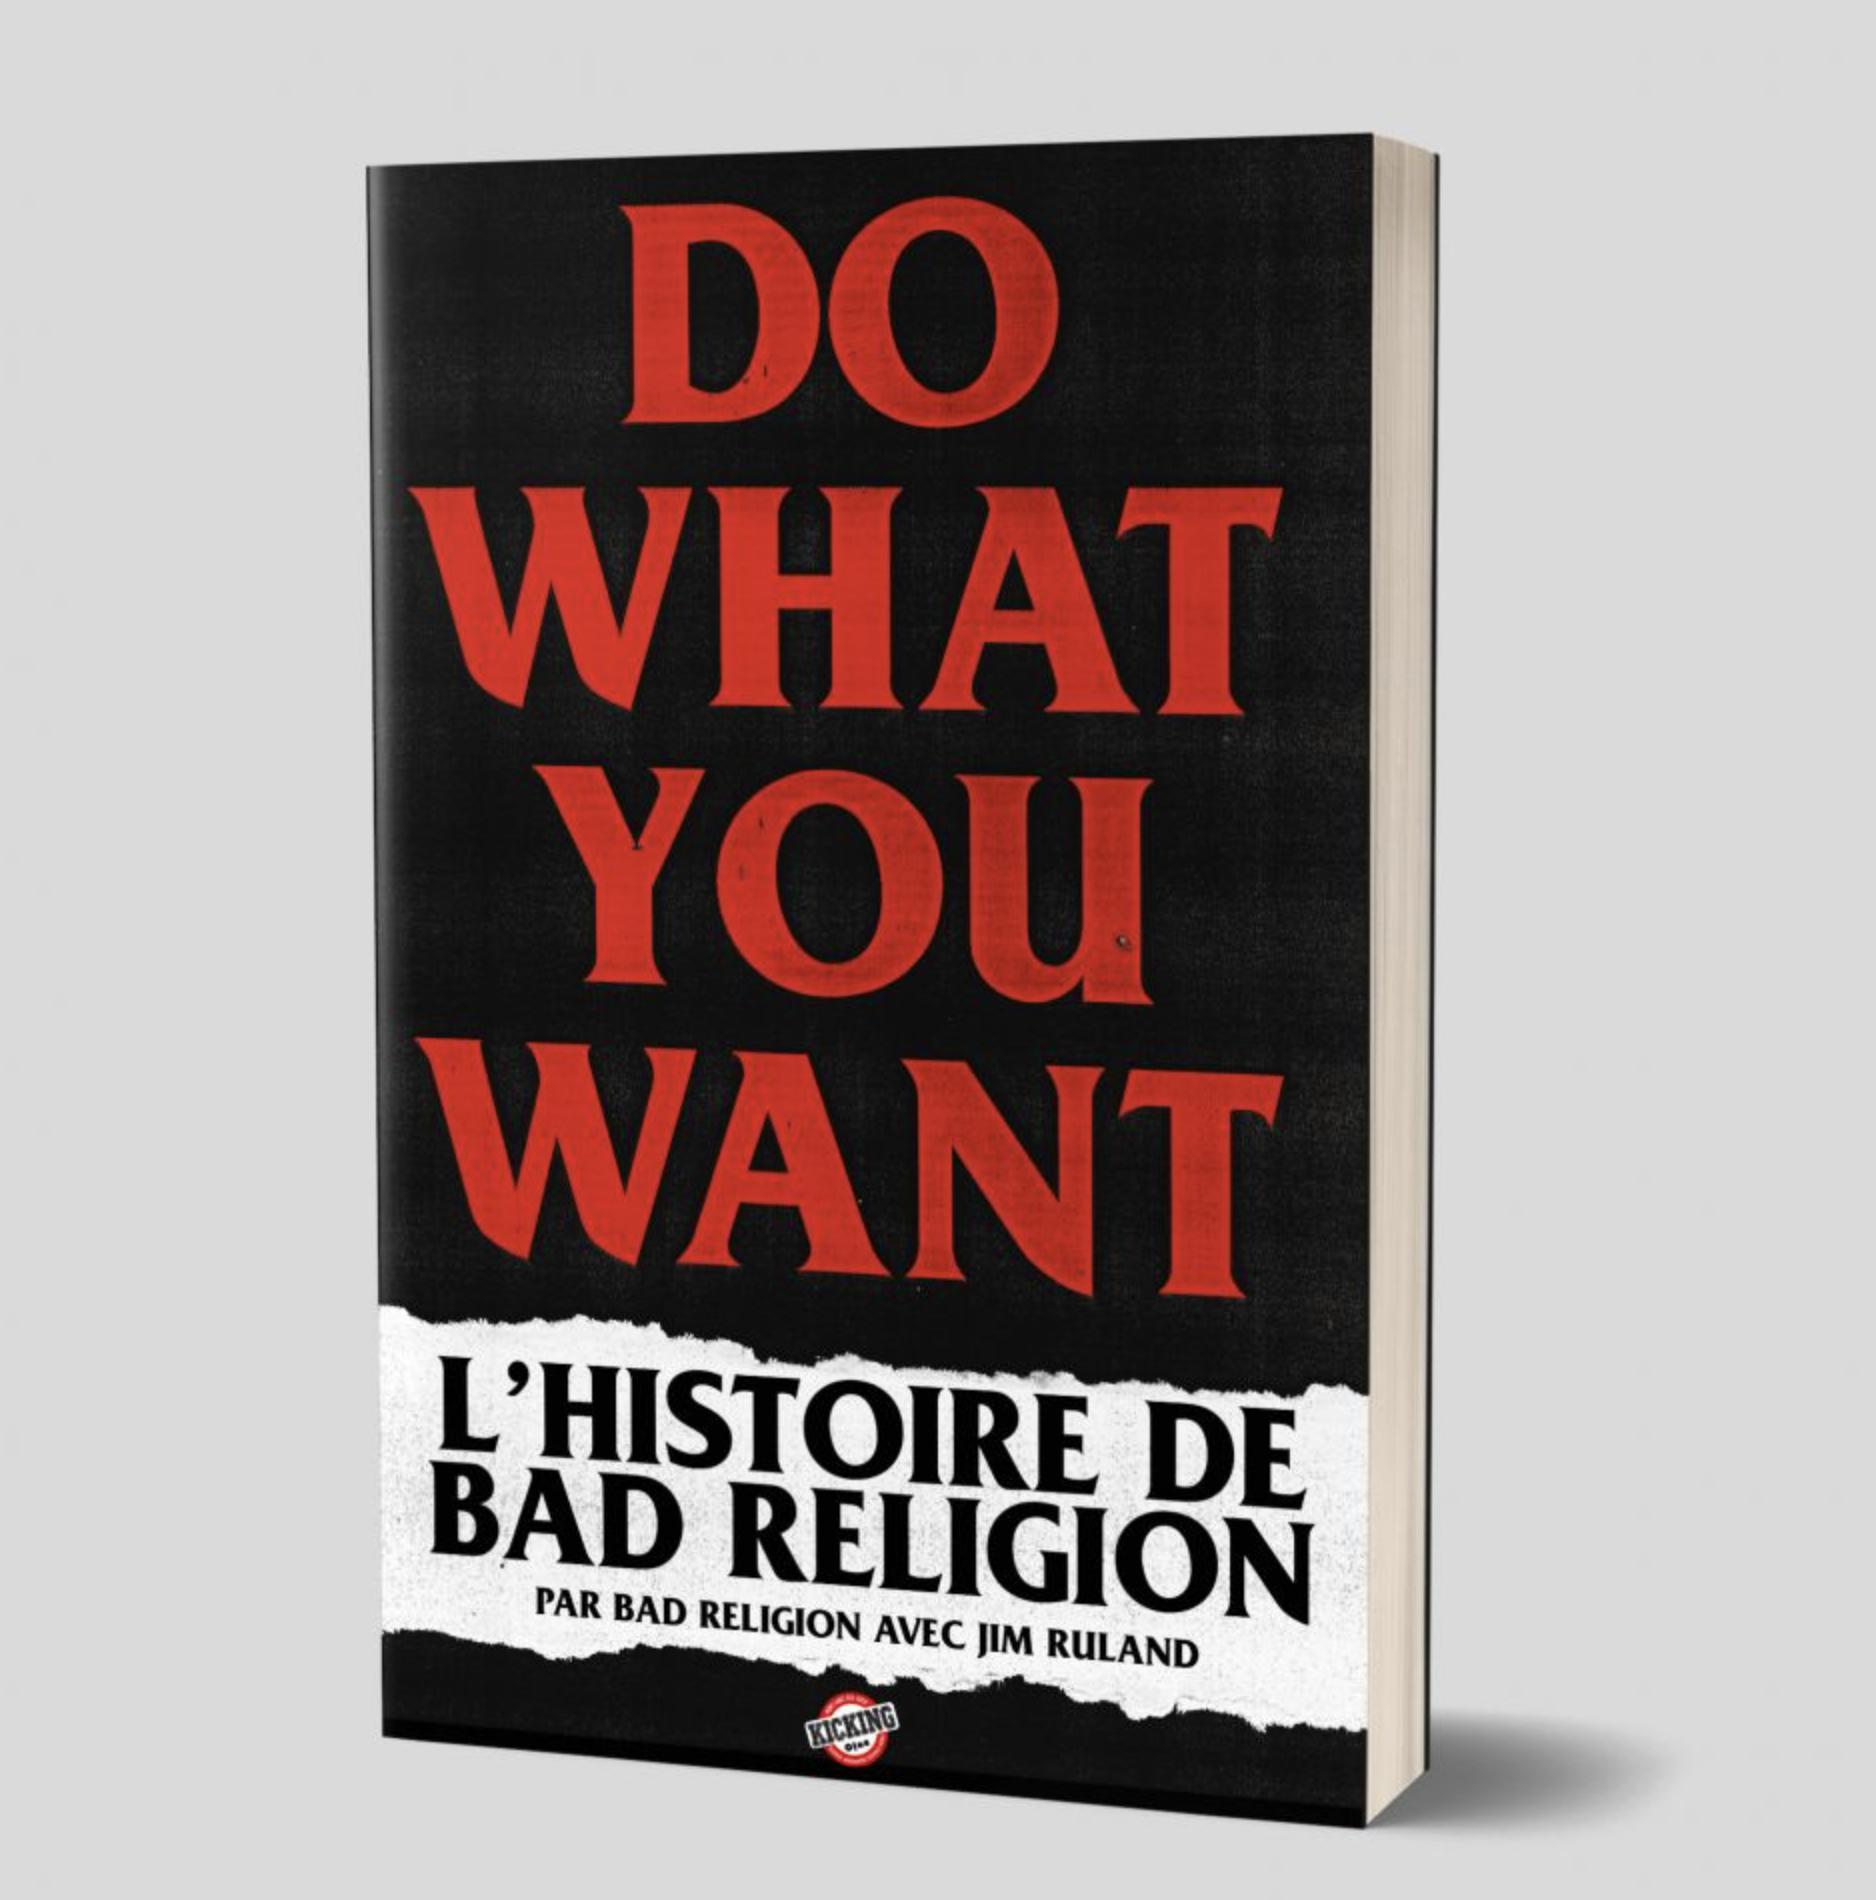 Bad Religion : Do What You Want L'histoire de Bad Religion